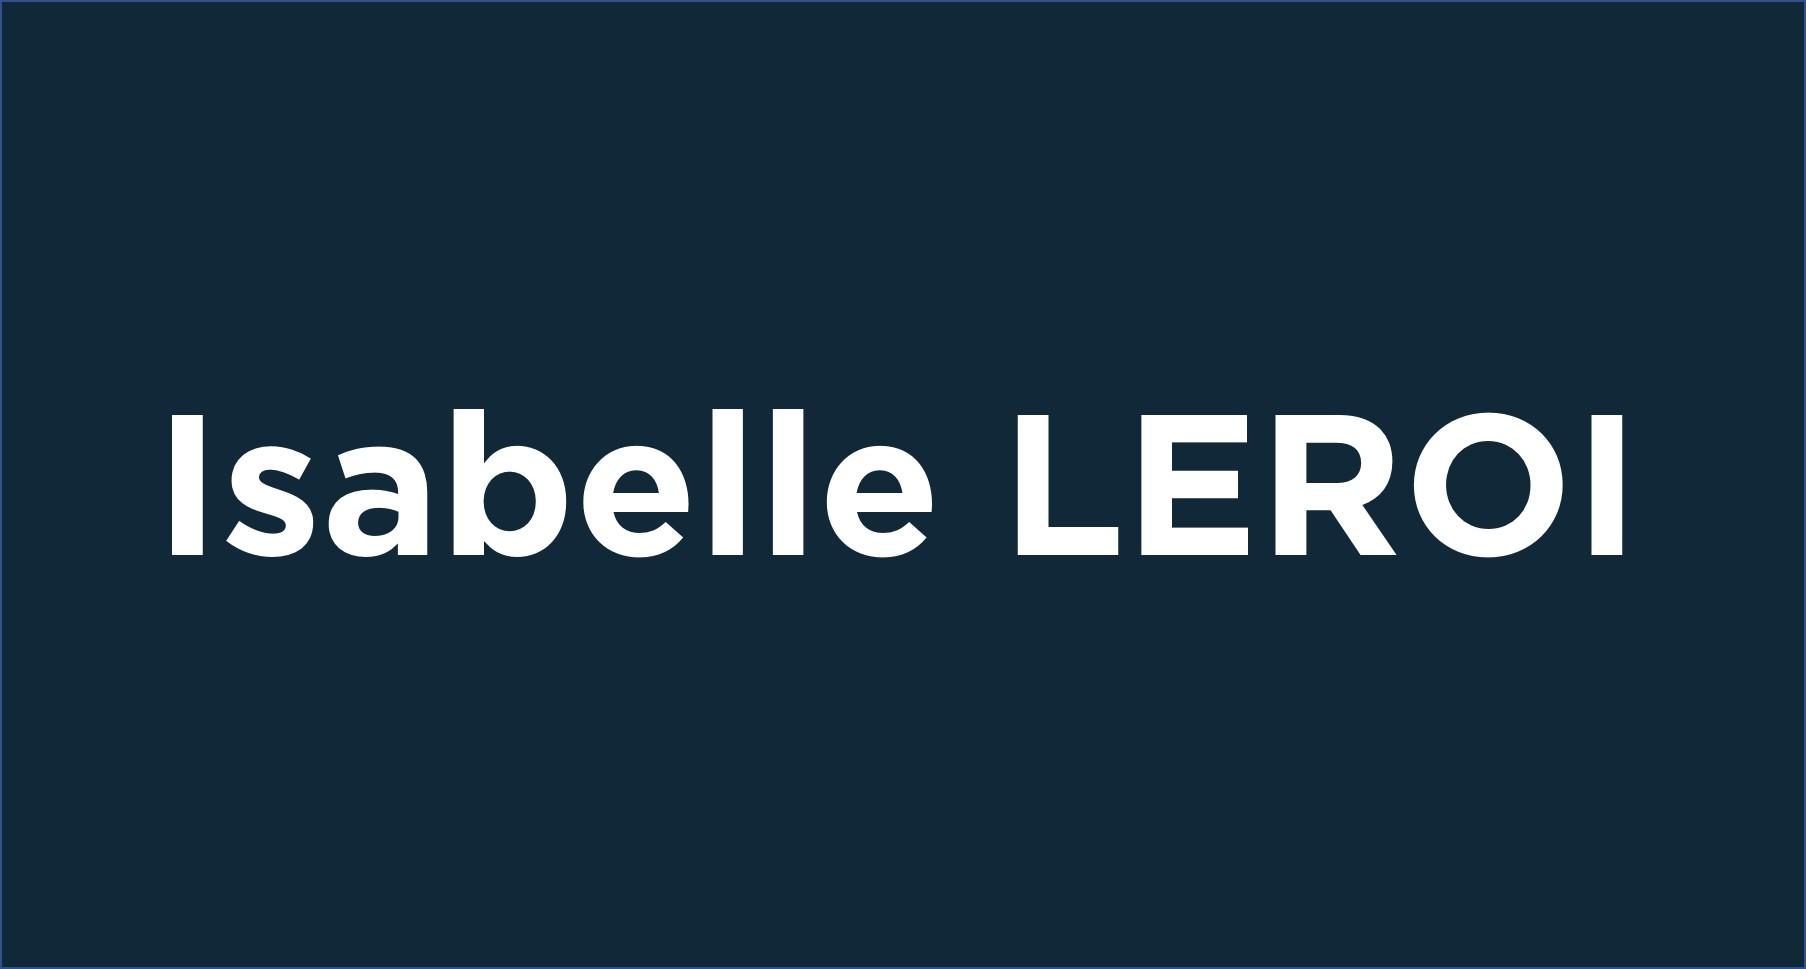 Isabelle Leroi